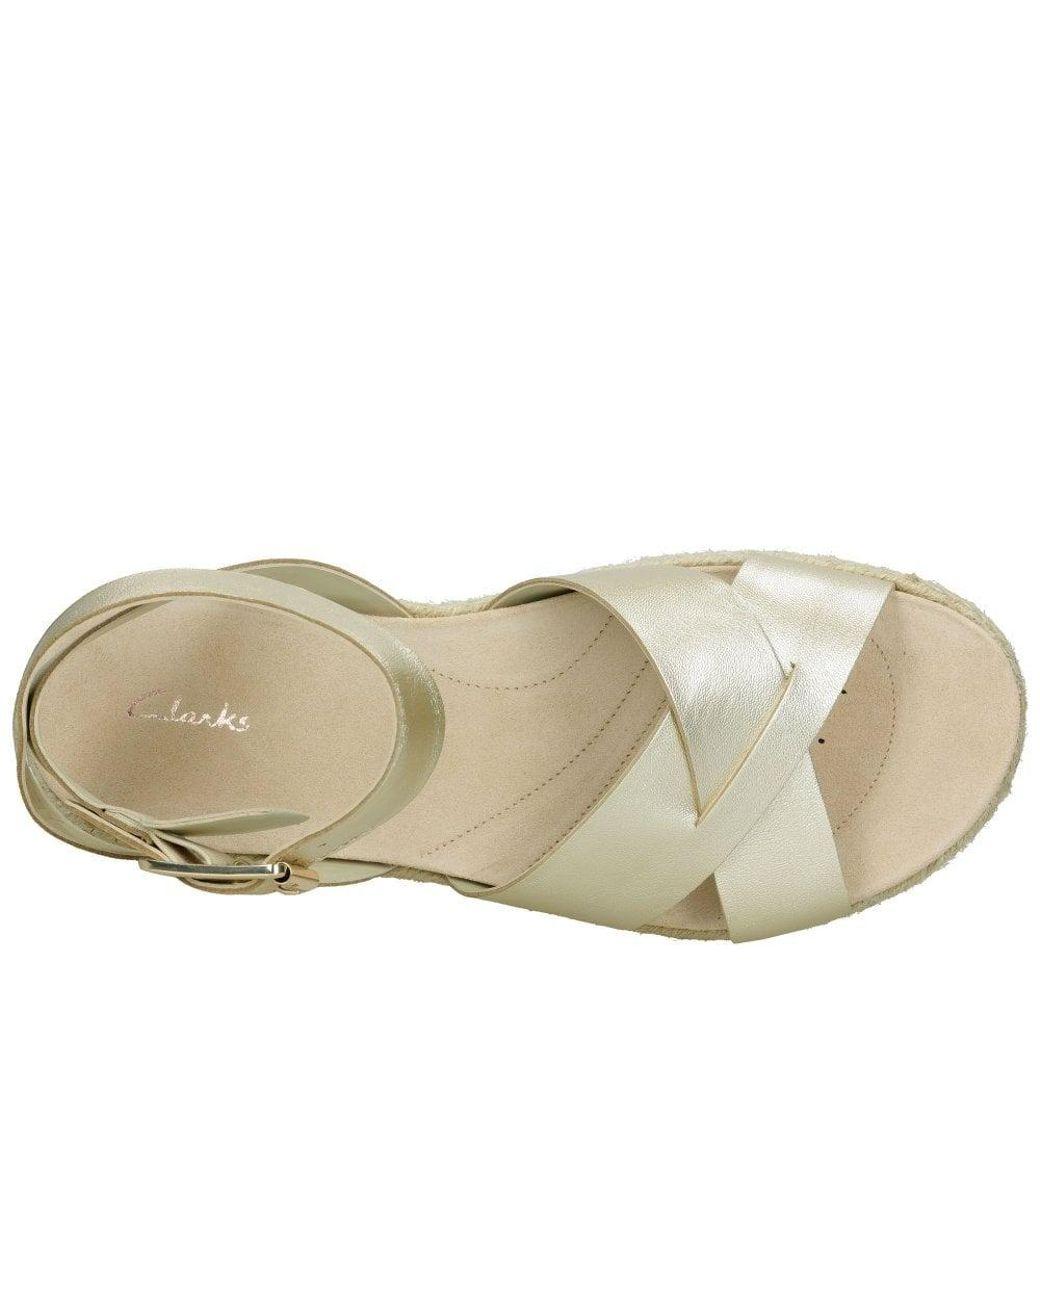 3aa8af98fc02 Clarks Botanic Poppy Womens Metallic Espadrille Sandals in Metallic - Lyst